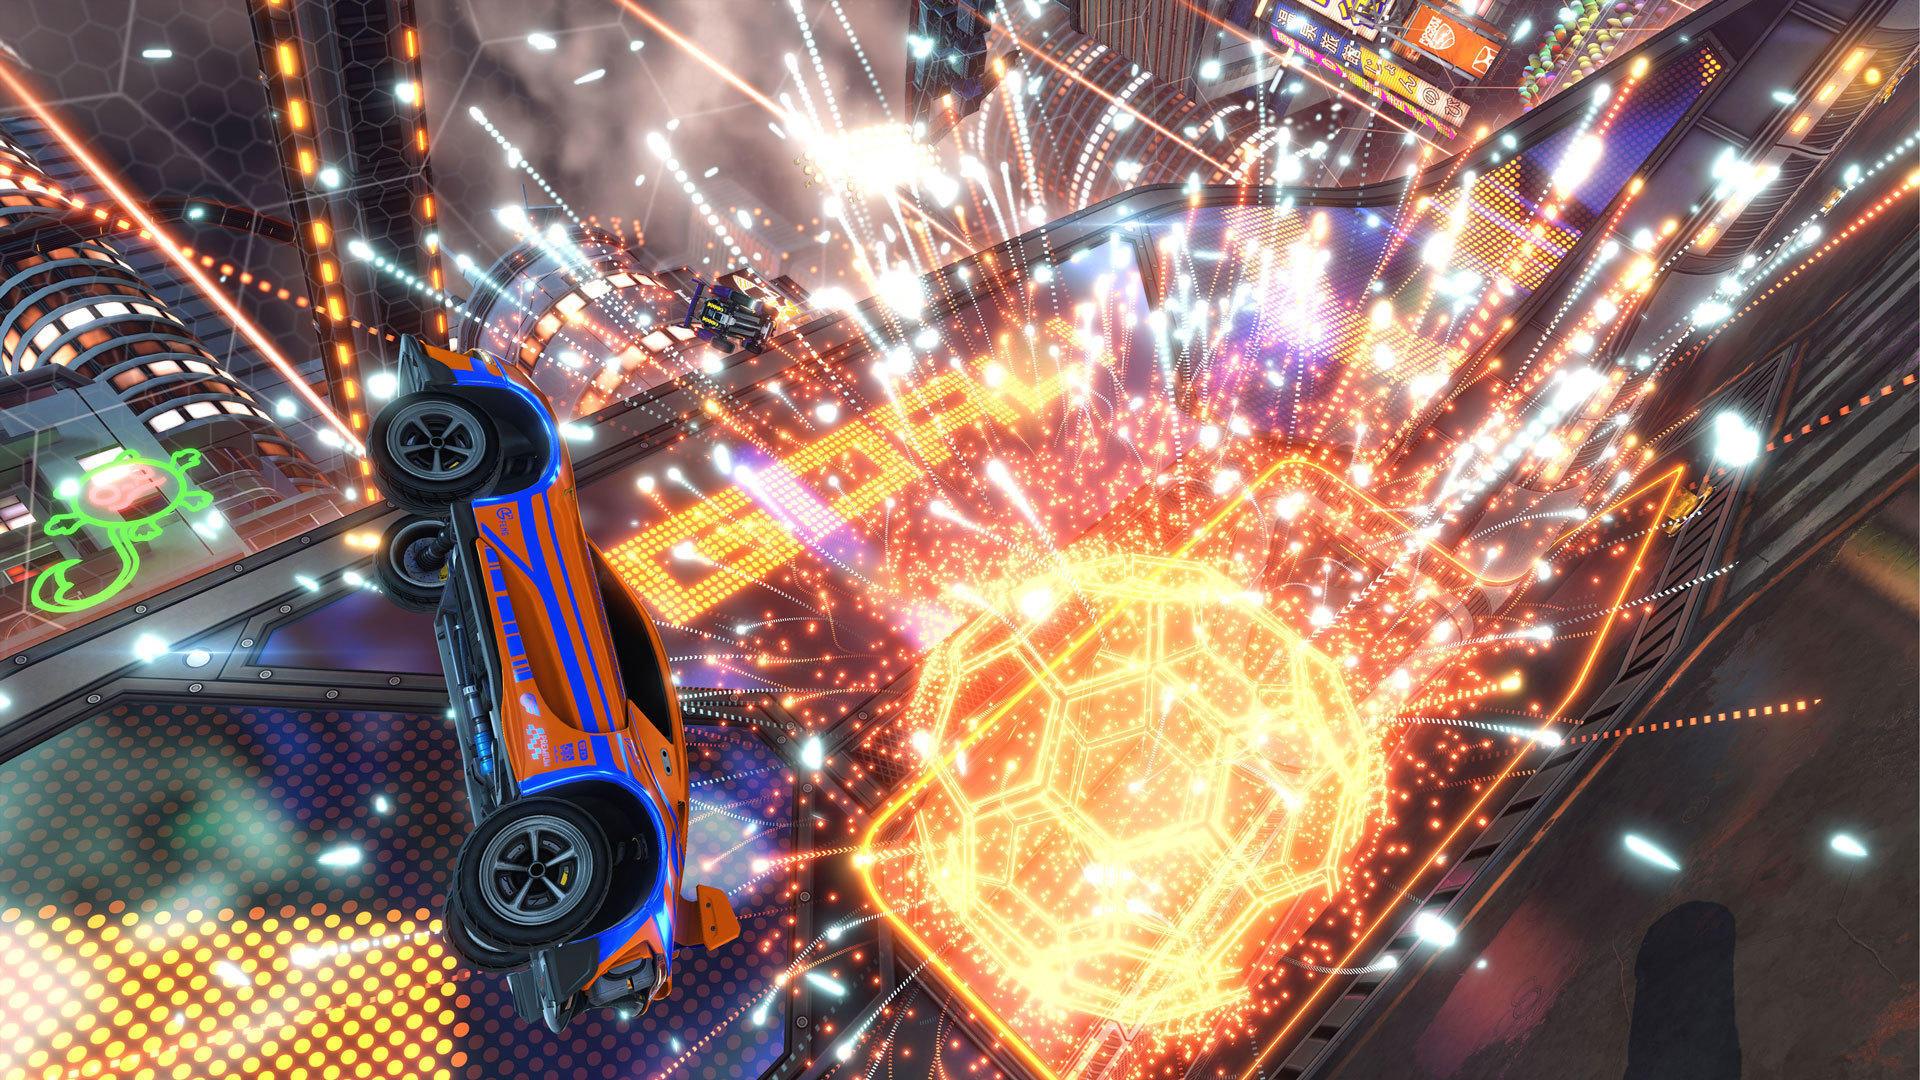 The best Rocket League items released in 2019